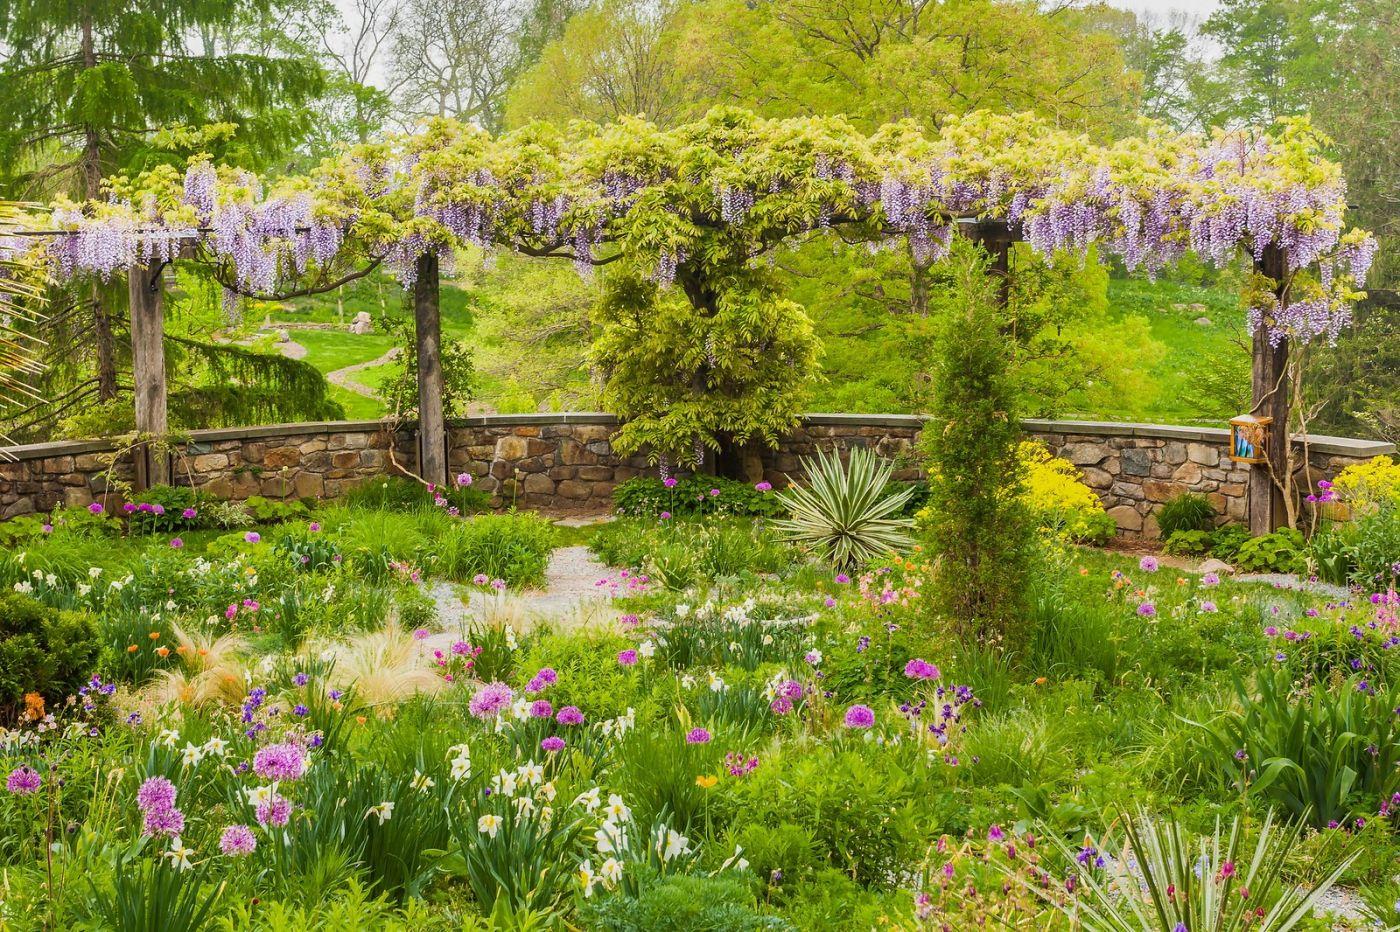 Chanticleer花园,那年盛开的紫藤花_图1-30